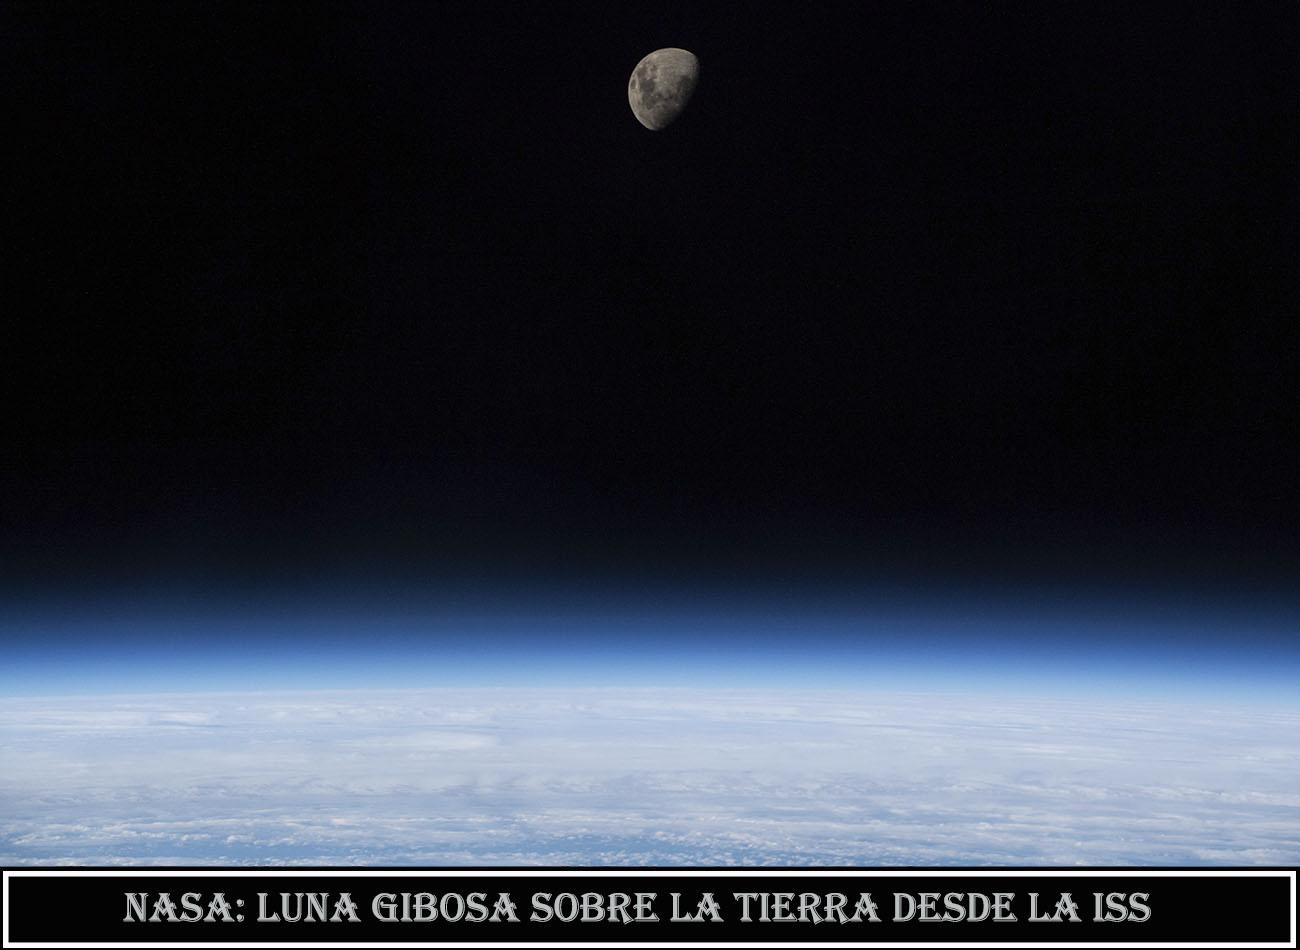 Luna-Tierra desde la ISS-WEB